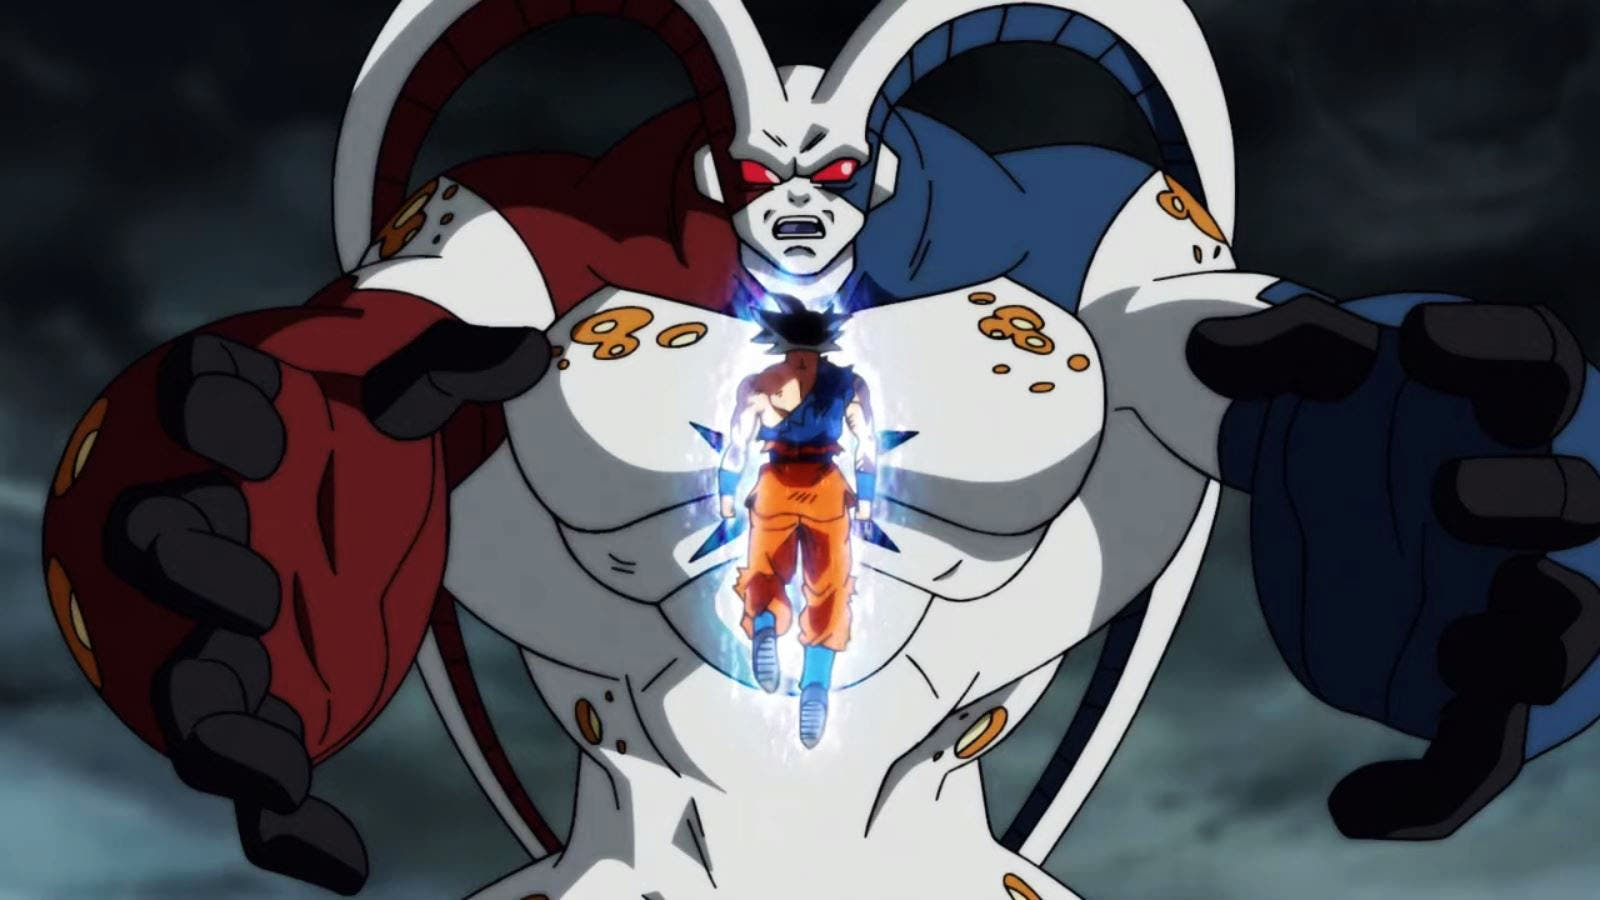 Imagen de Crítica de Dragon Ball Heroes episodio 14: Ultra Instinto vs. Ozaru